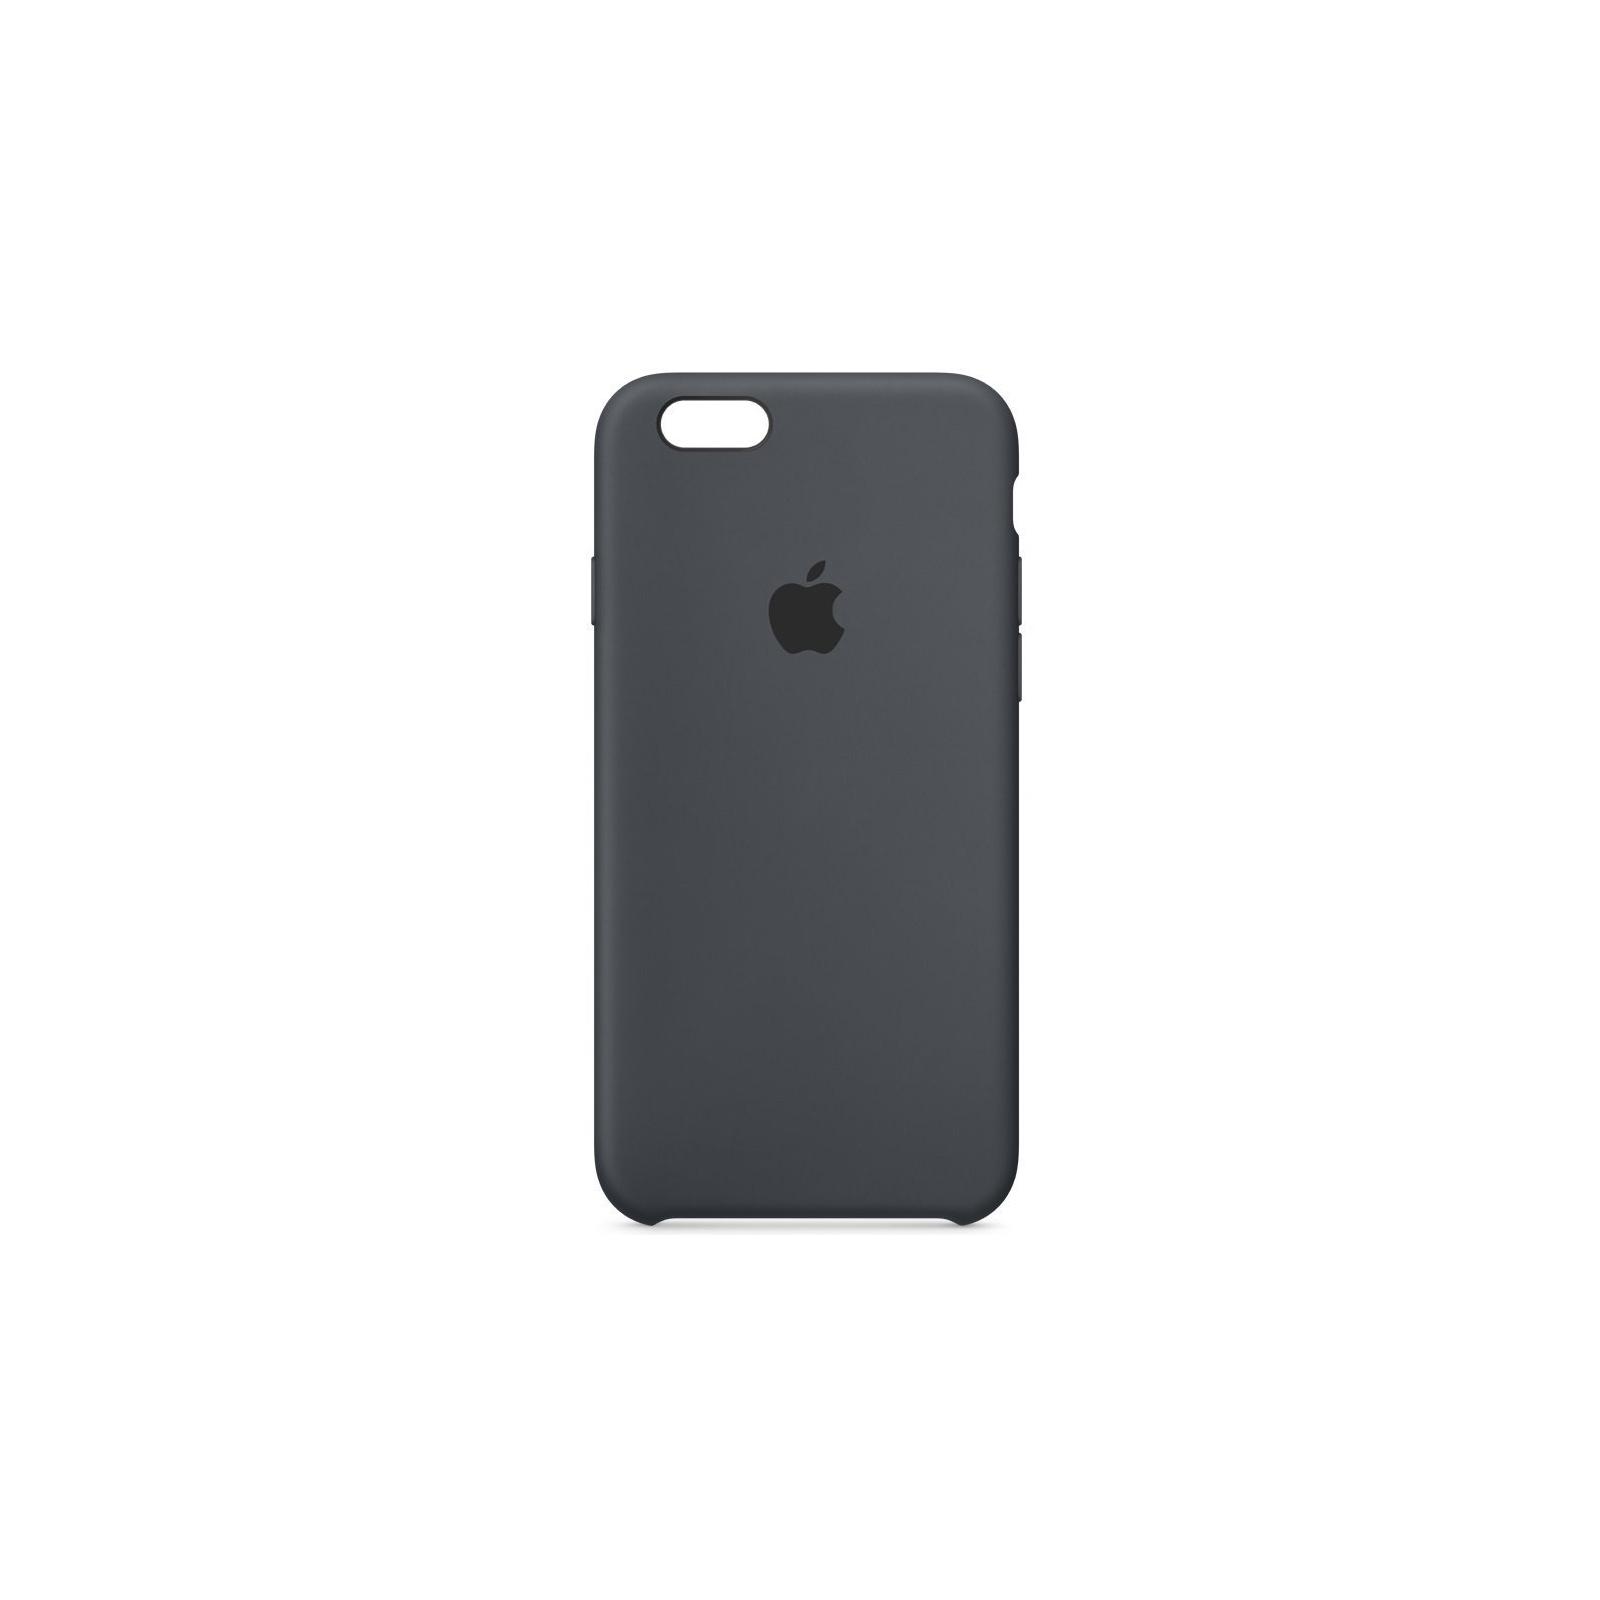 Чехол для моб. телефона Apple для iPhone 6/6s Charcoal Gray (MKY02ZM/A)